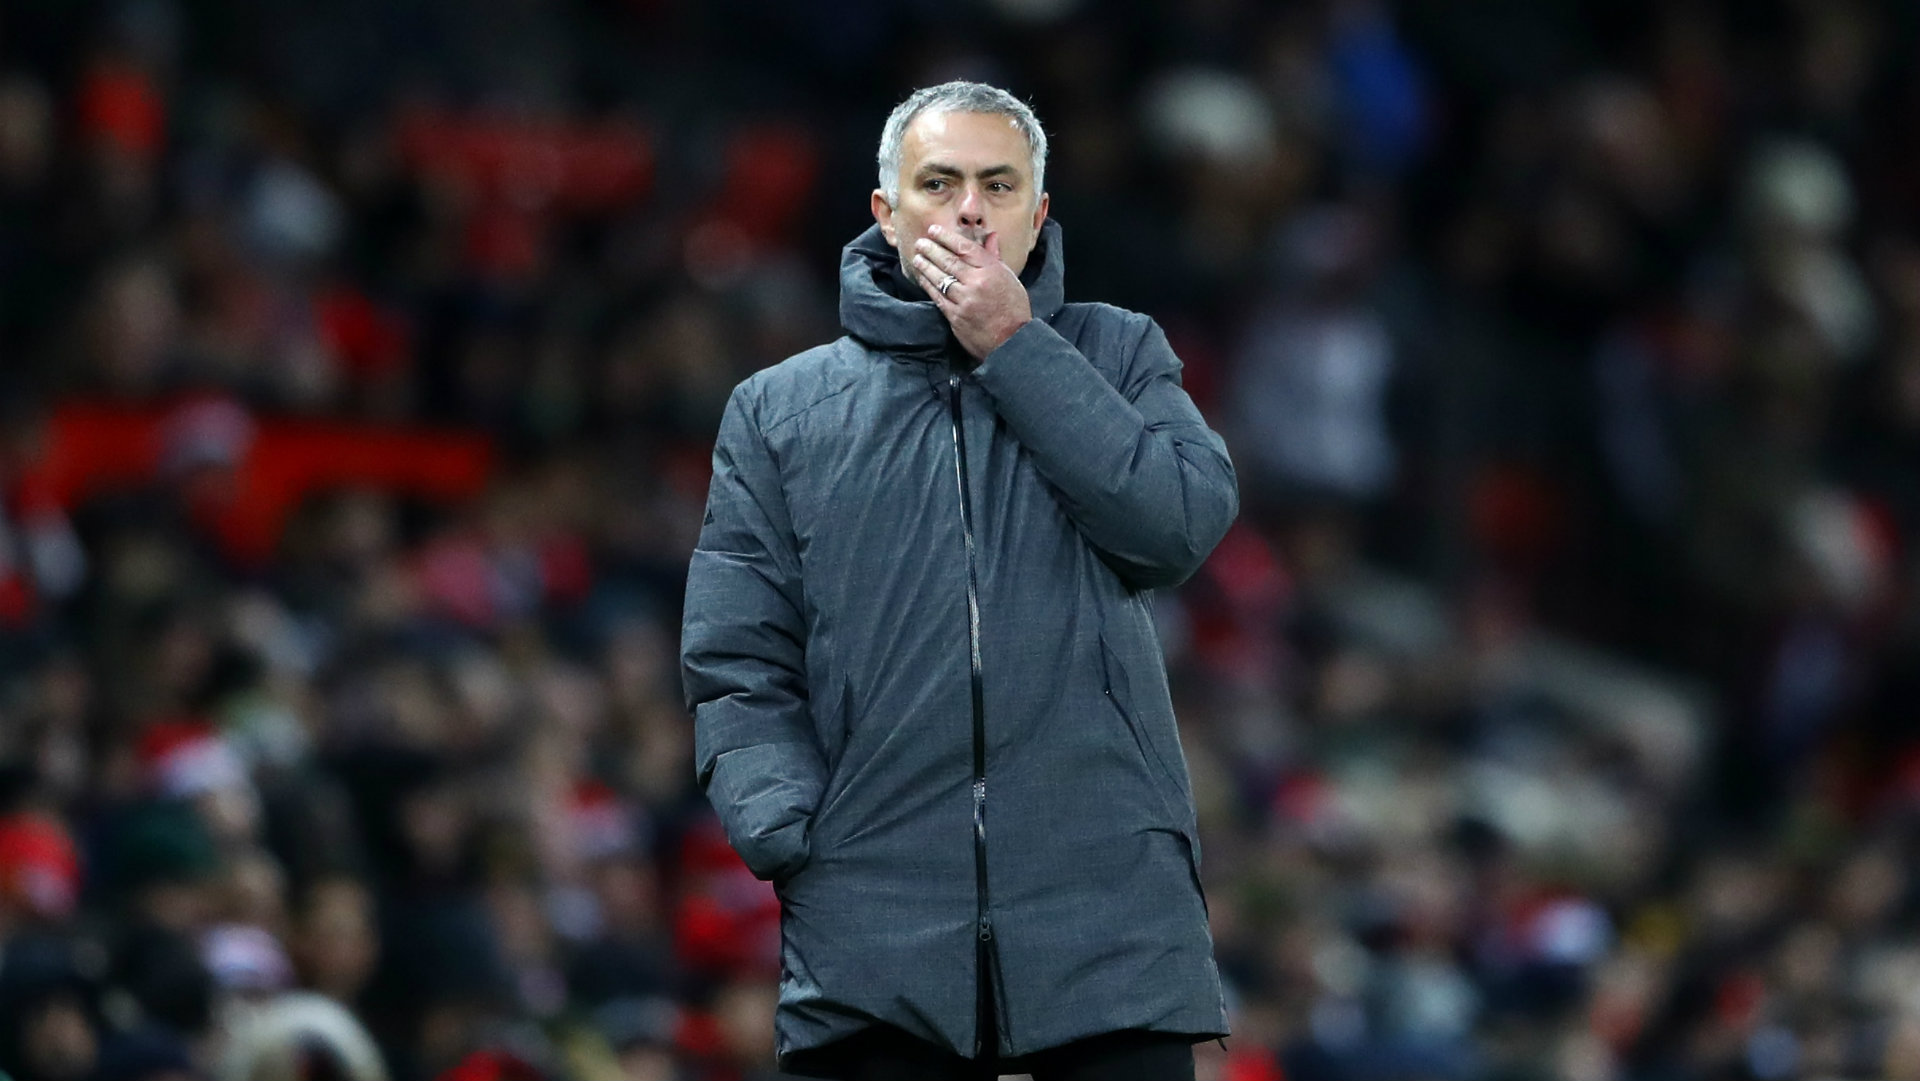 Jose Mourinho, Manchester United vs Manchester City, 17/18